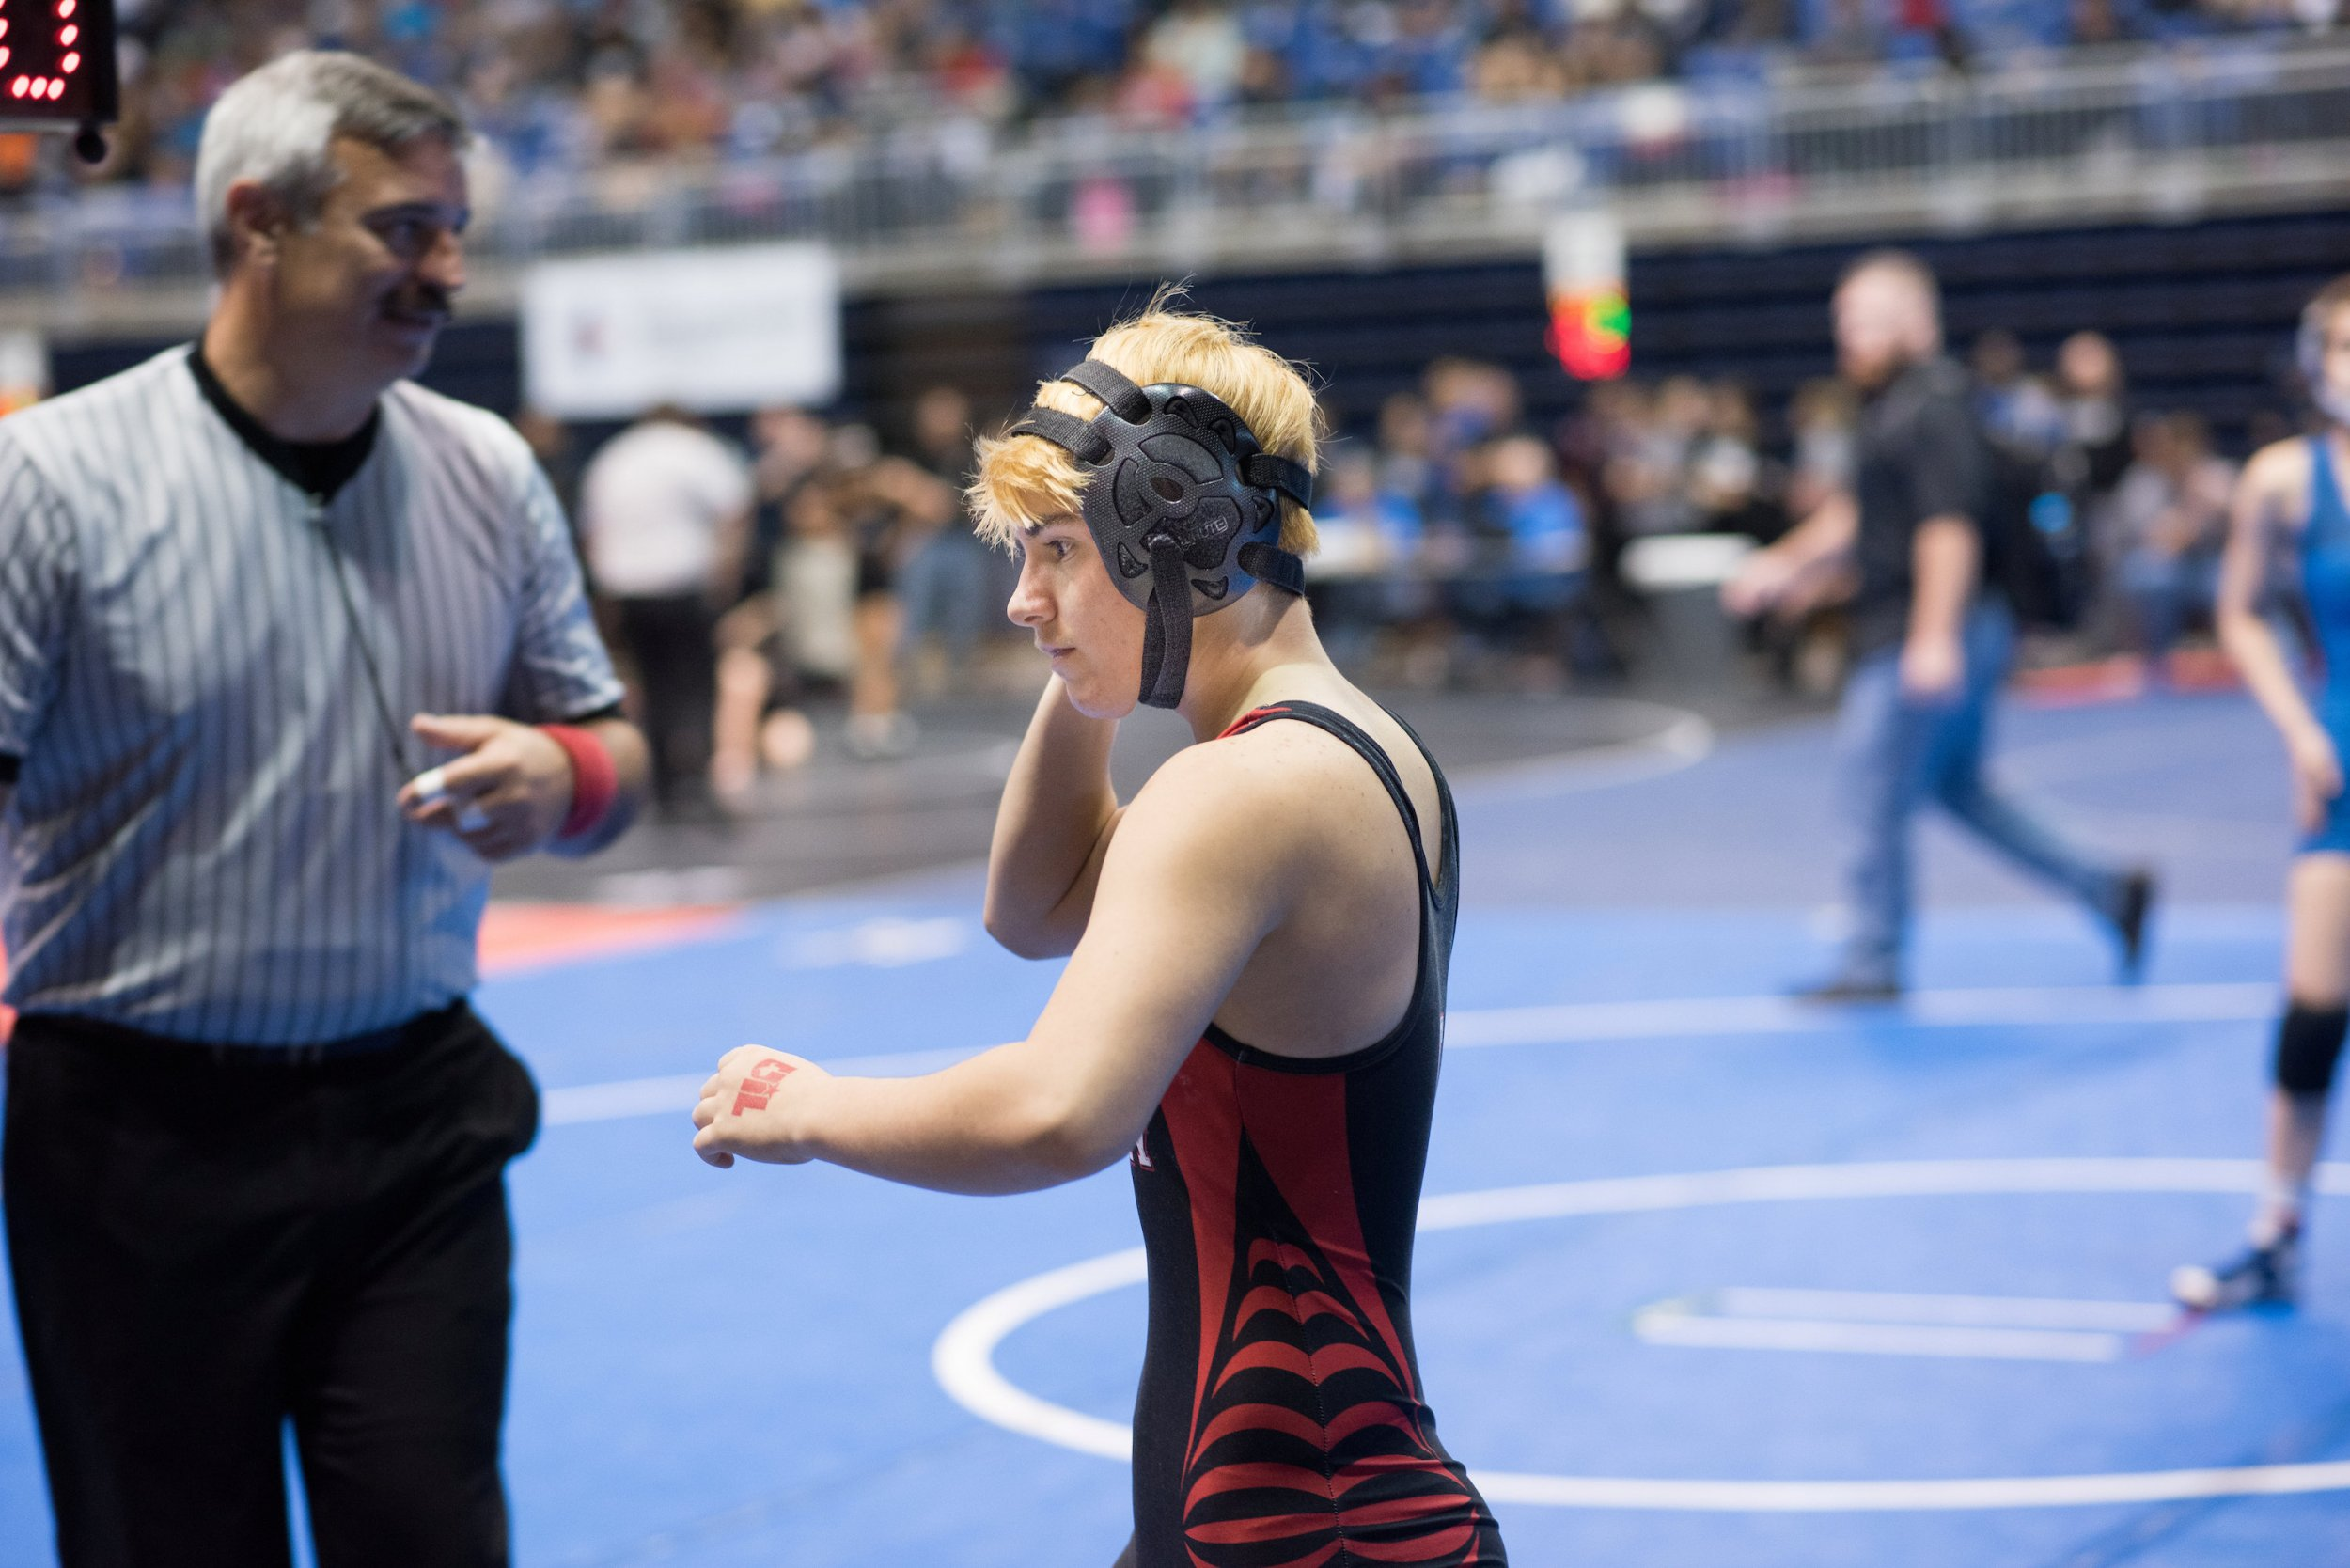 Transgender wrestler who identifies as male hears boos after ...